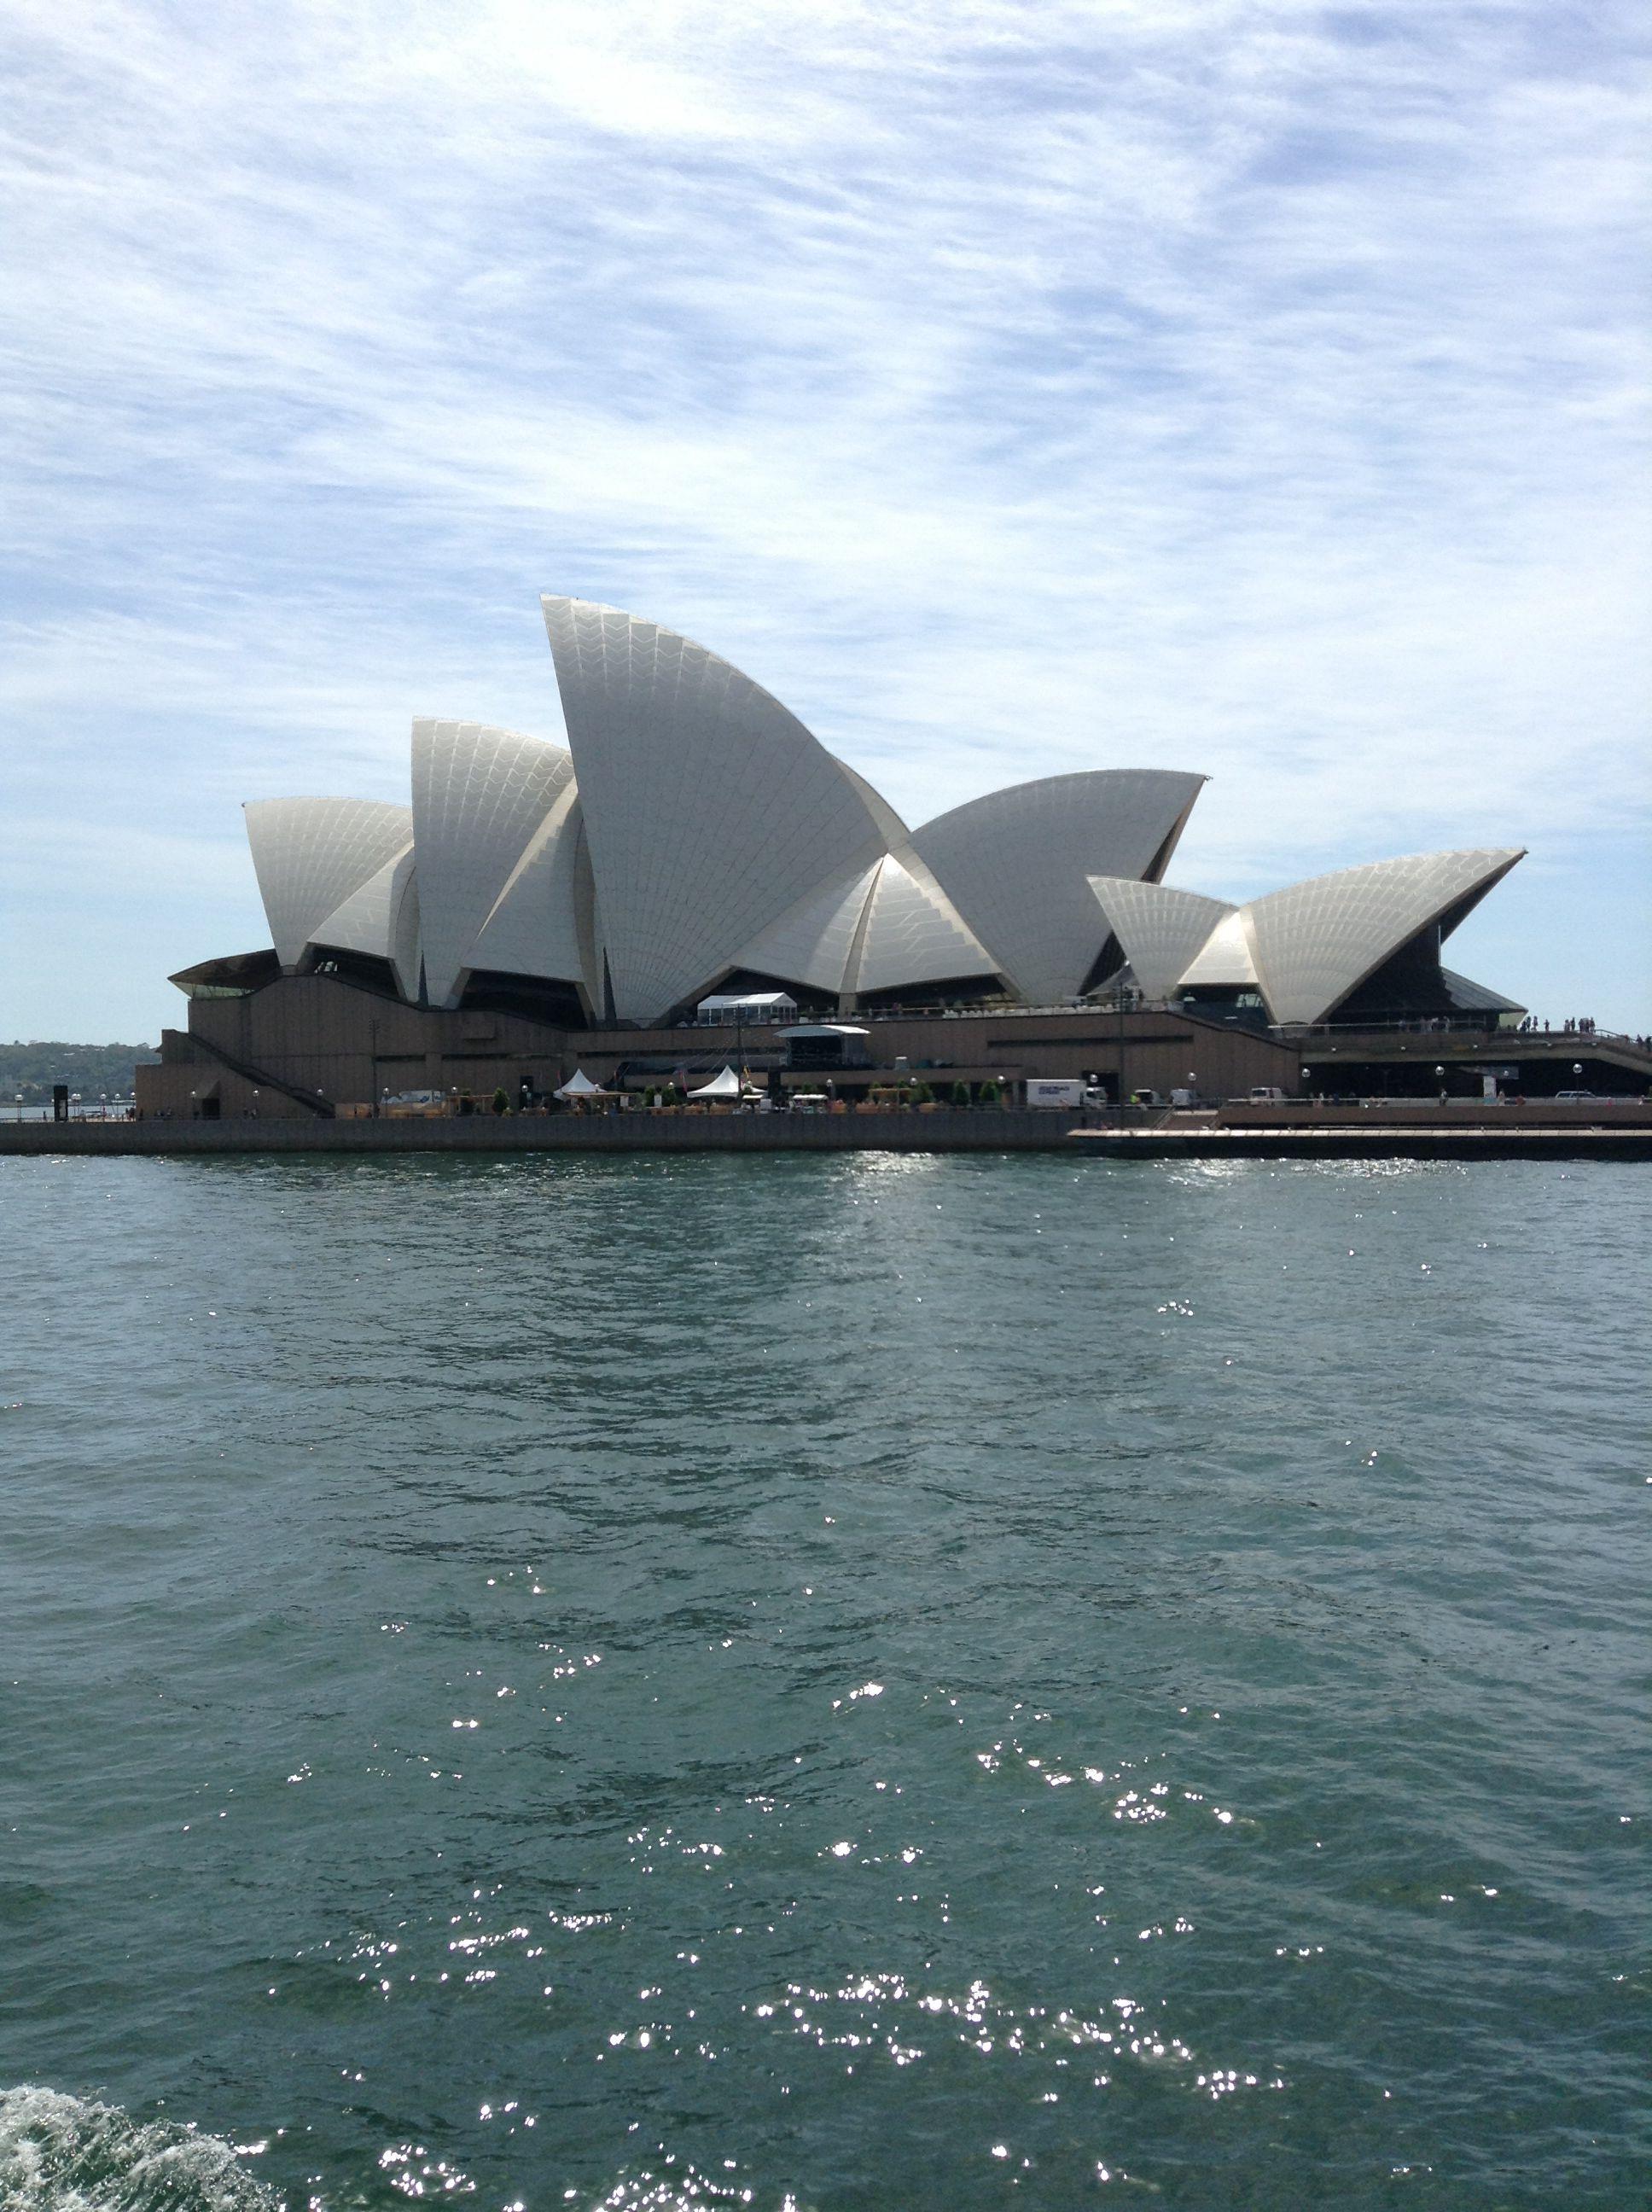 Sydney Opera House. So beautiful!